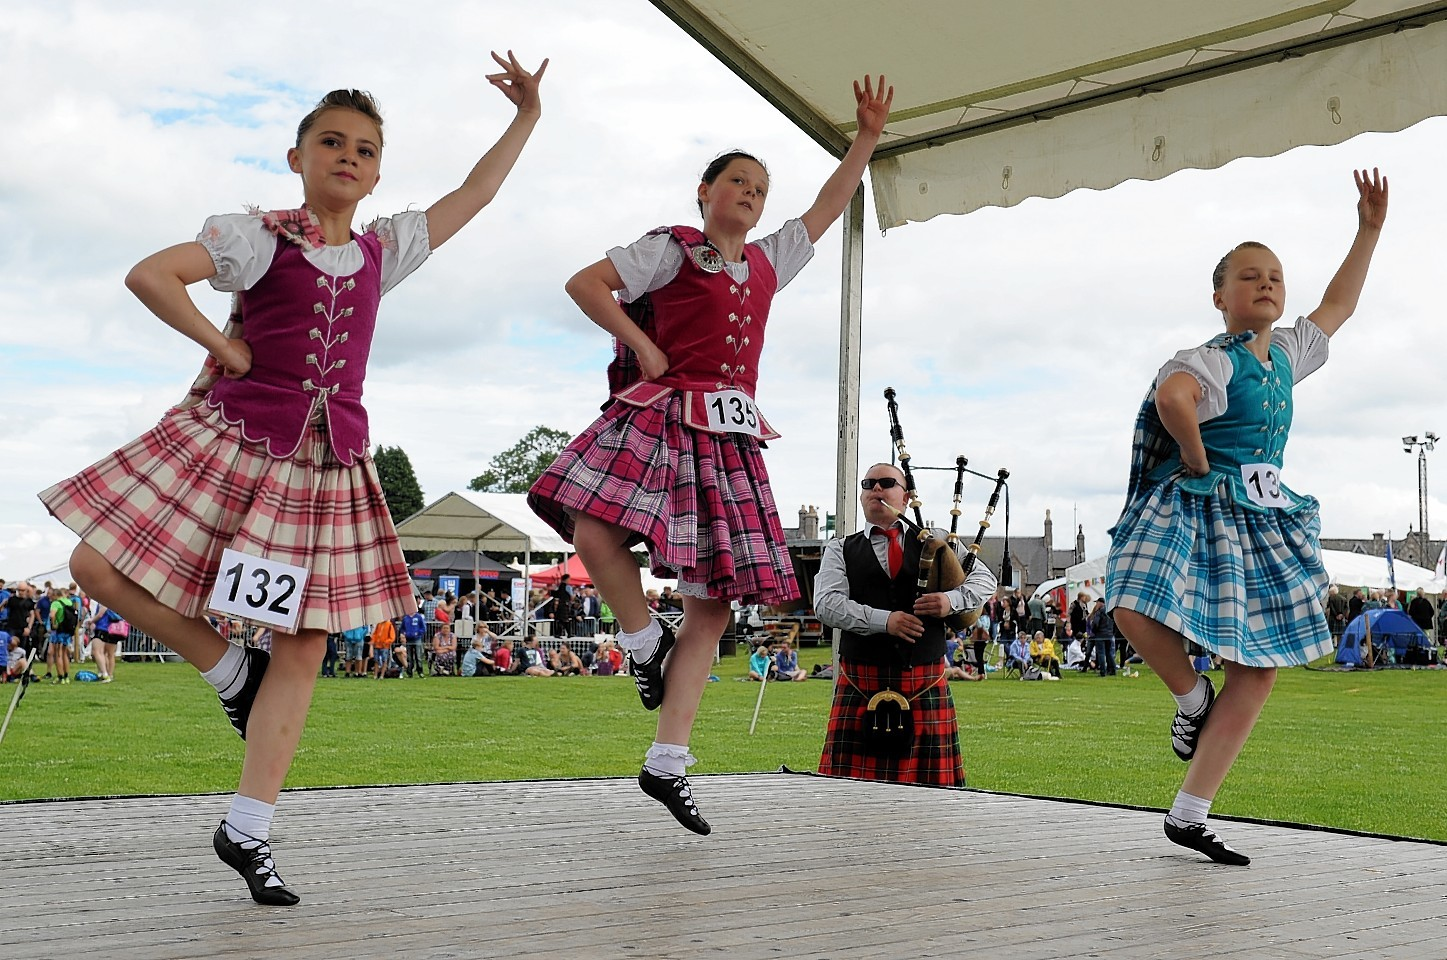 Picture of Highland dancers (L-R) Katie Douglas, 10, Robyn Gordon, 11, Olivia Cameron Richardson, 11, at Aboyne Highland Games. Credit: Kenny Elrick.